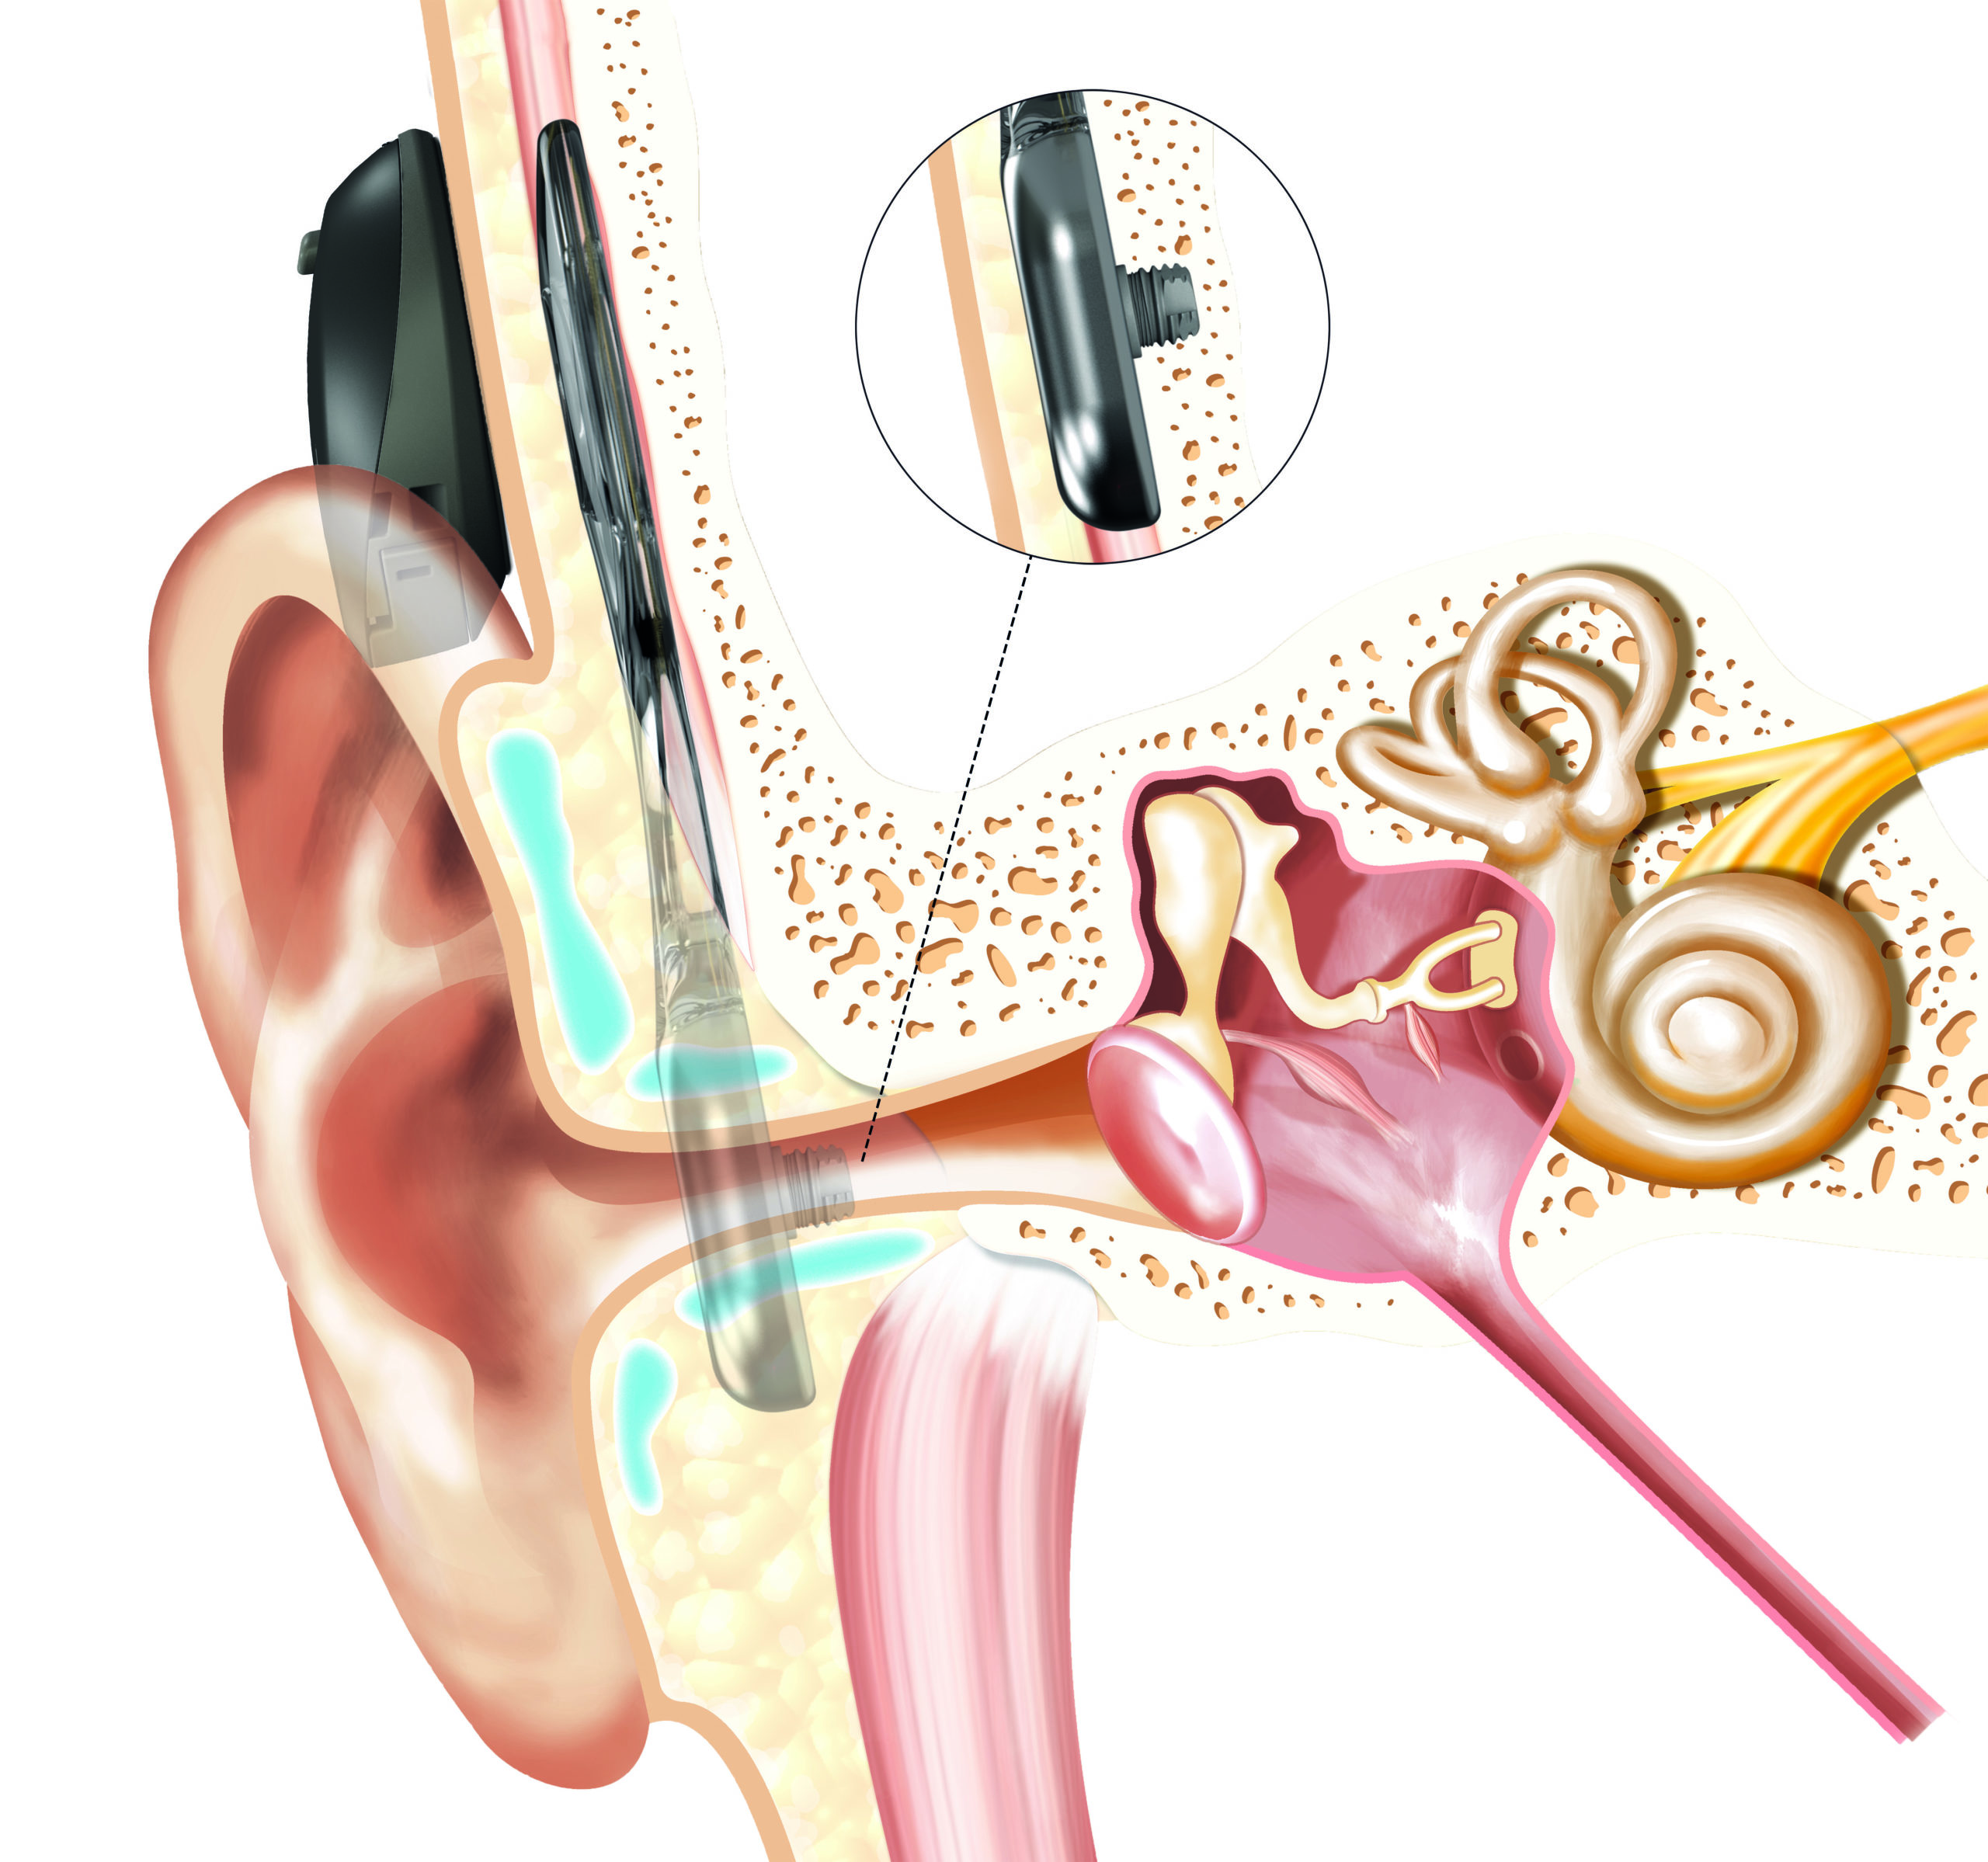 Implante de conducción ósea: Osia®